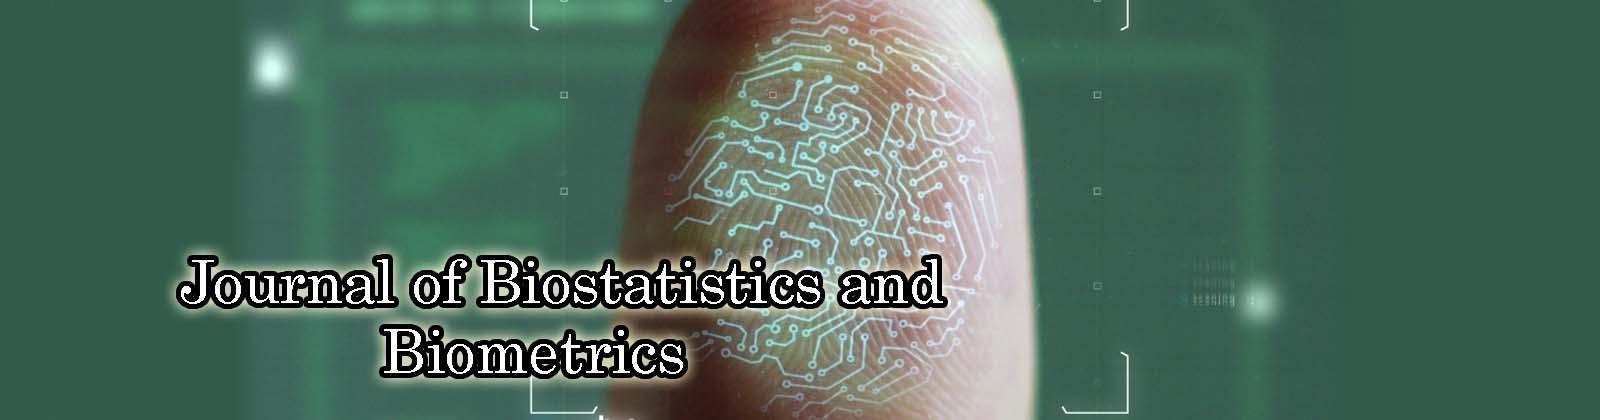 biostatistics publication article